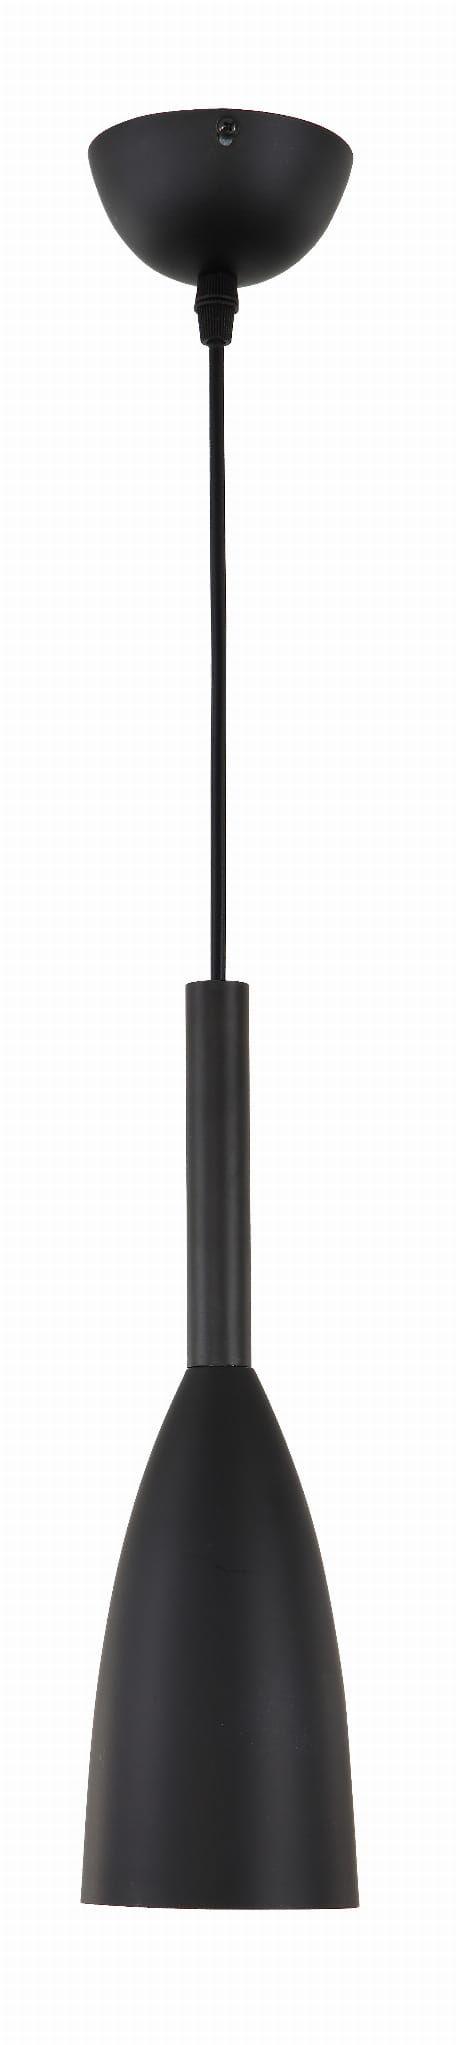 Light Prestige Solin LP-181/1P BK lampa wisząca czarna metalowa 1x60W E27 11cm